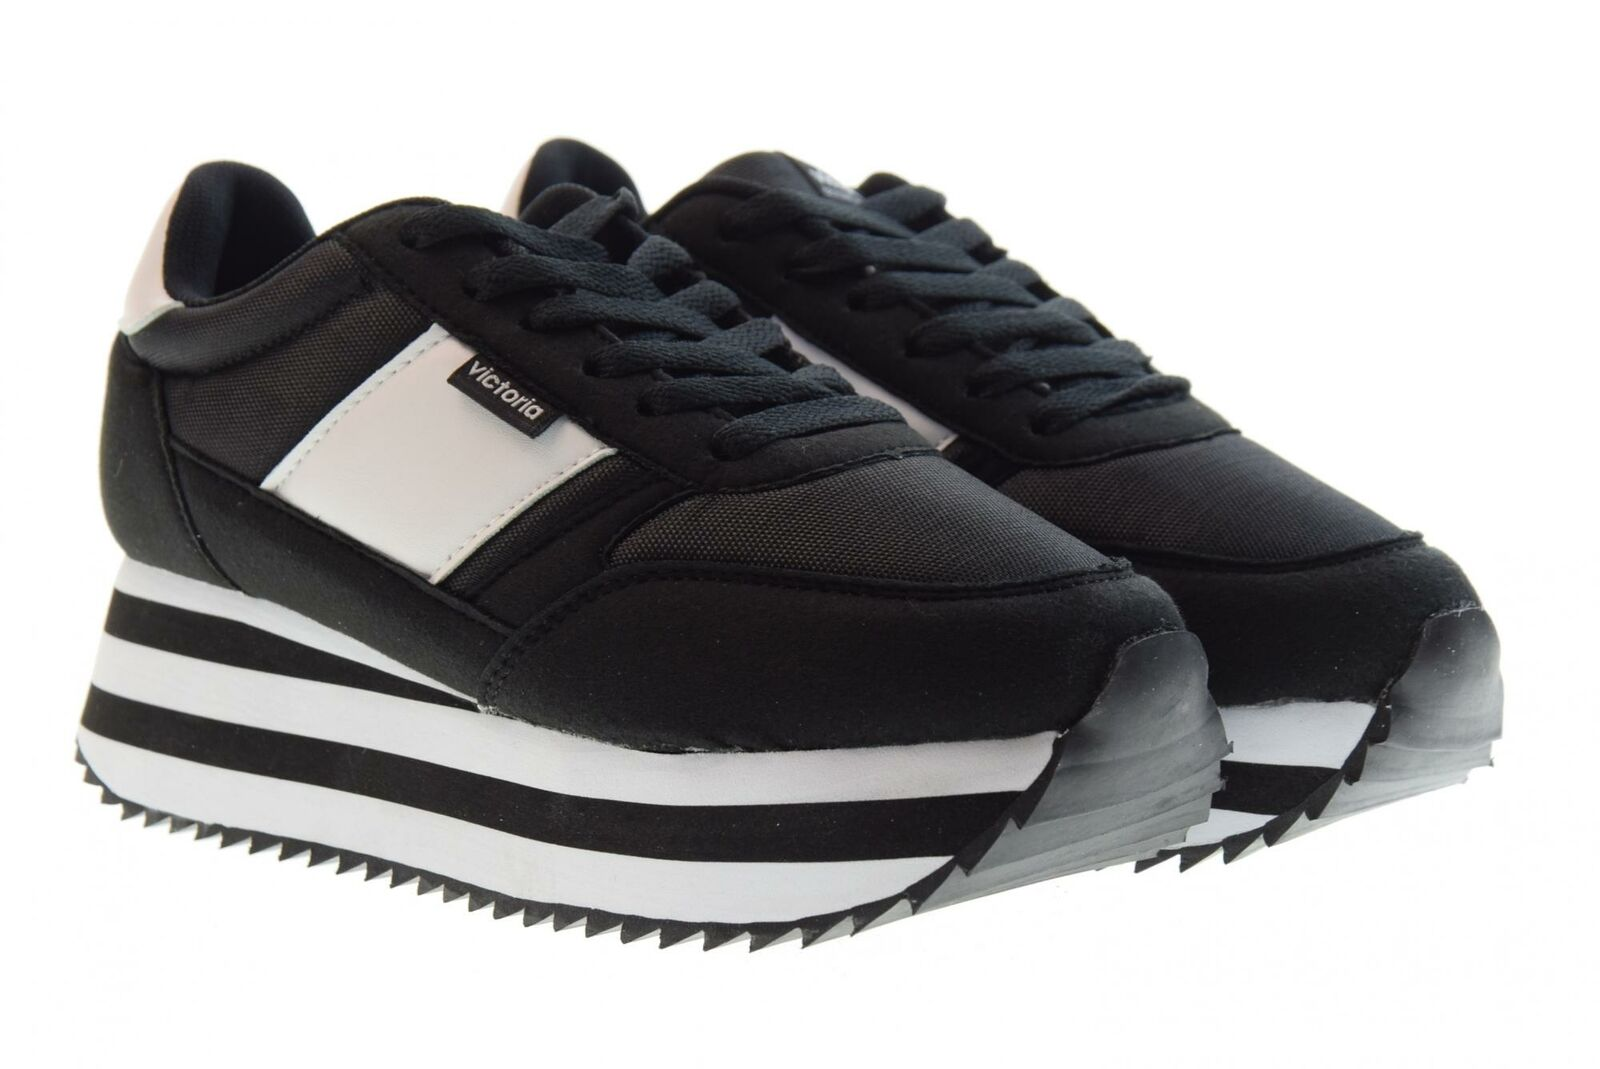 new arrival b613f c1f05 Victoria P19f shoes femme basses avec plateforme 142107 black baskets  nyoydw2794-Women s Athletic Shoes